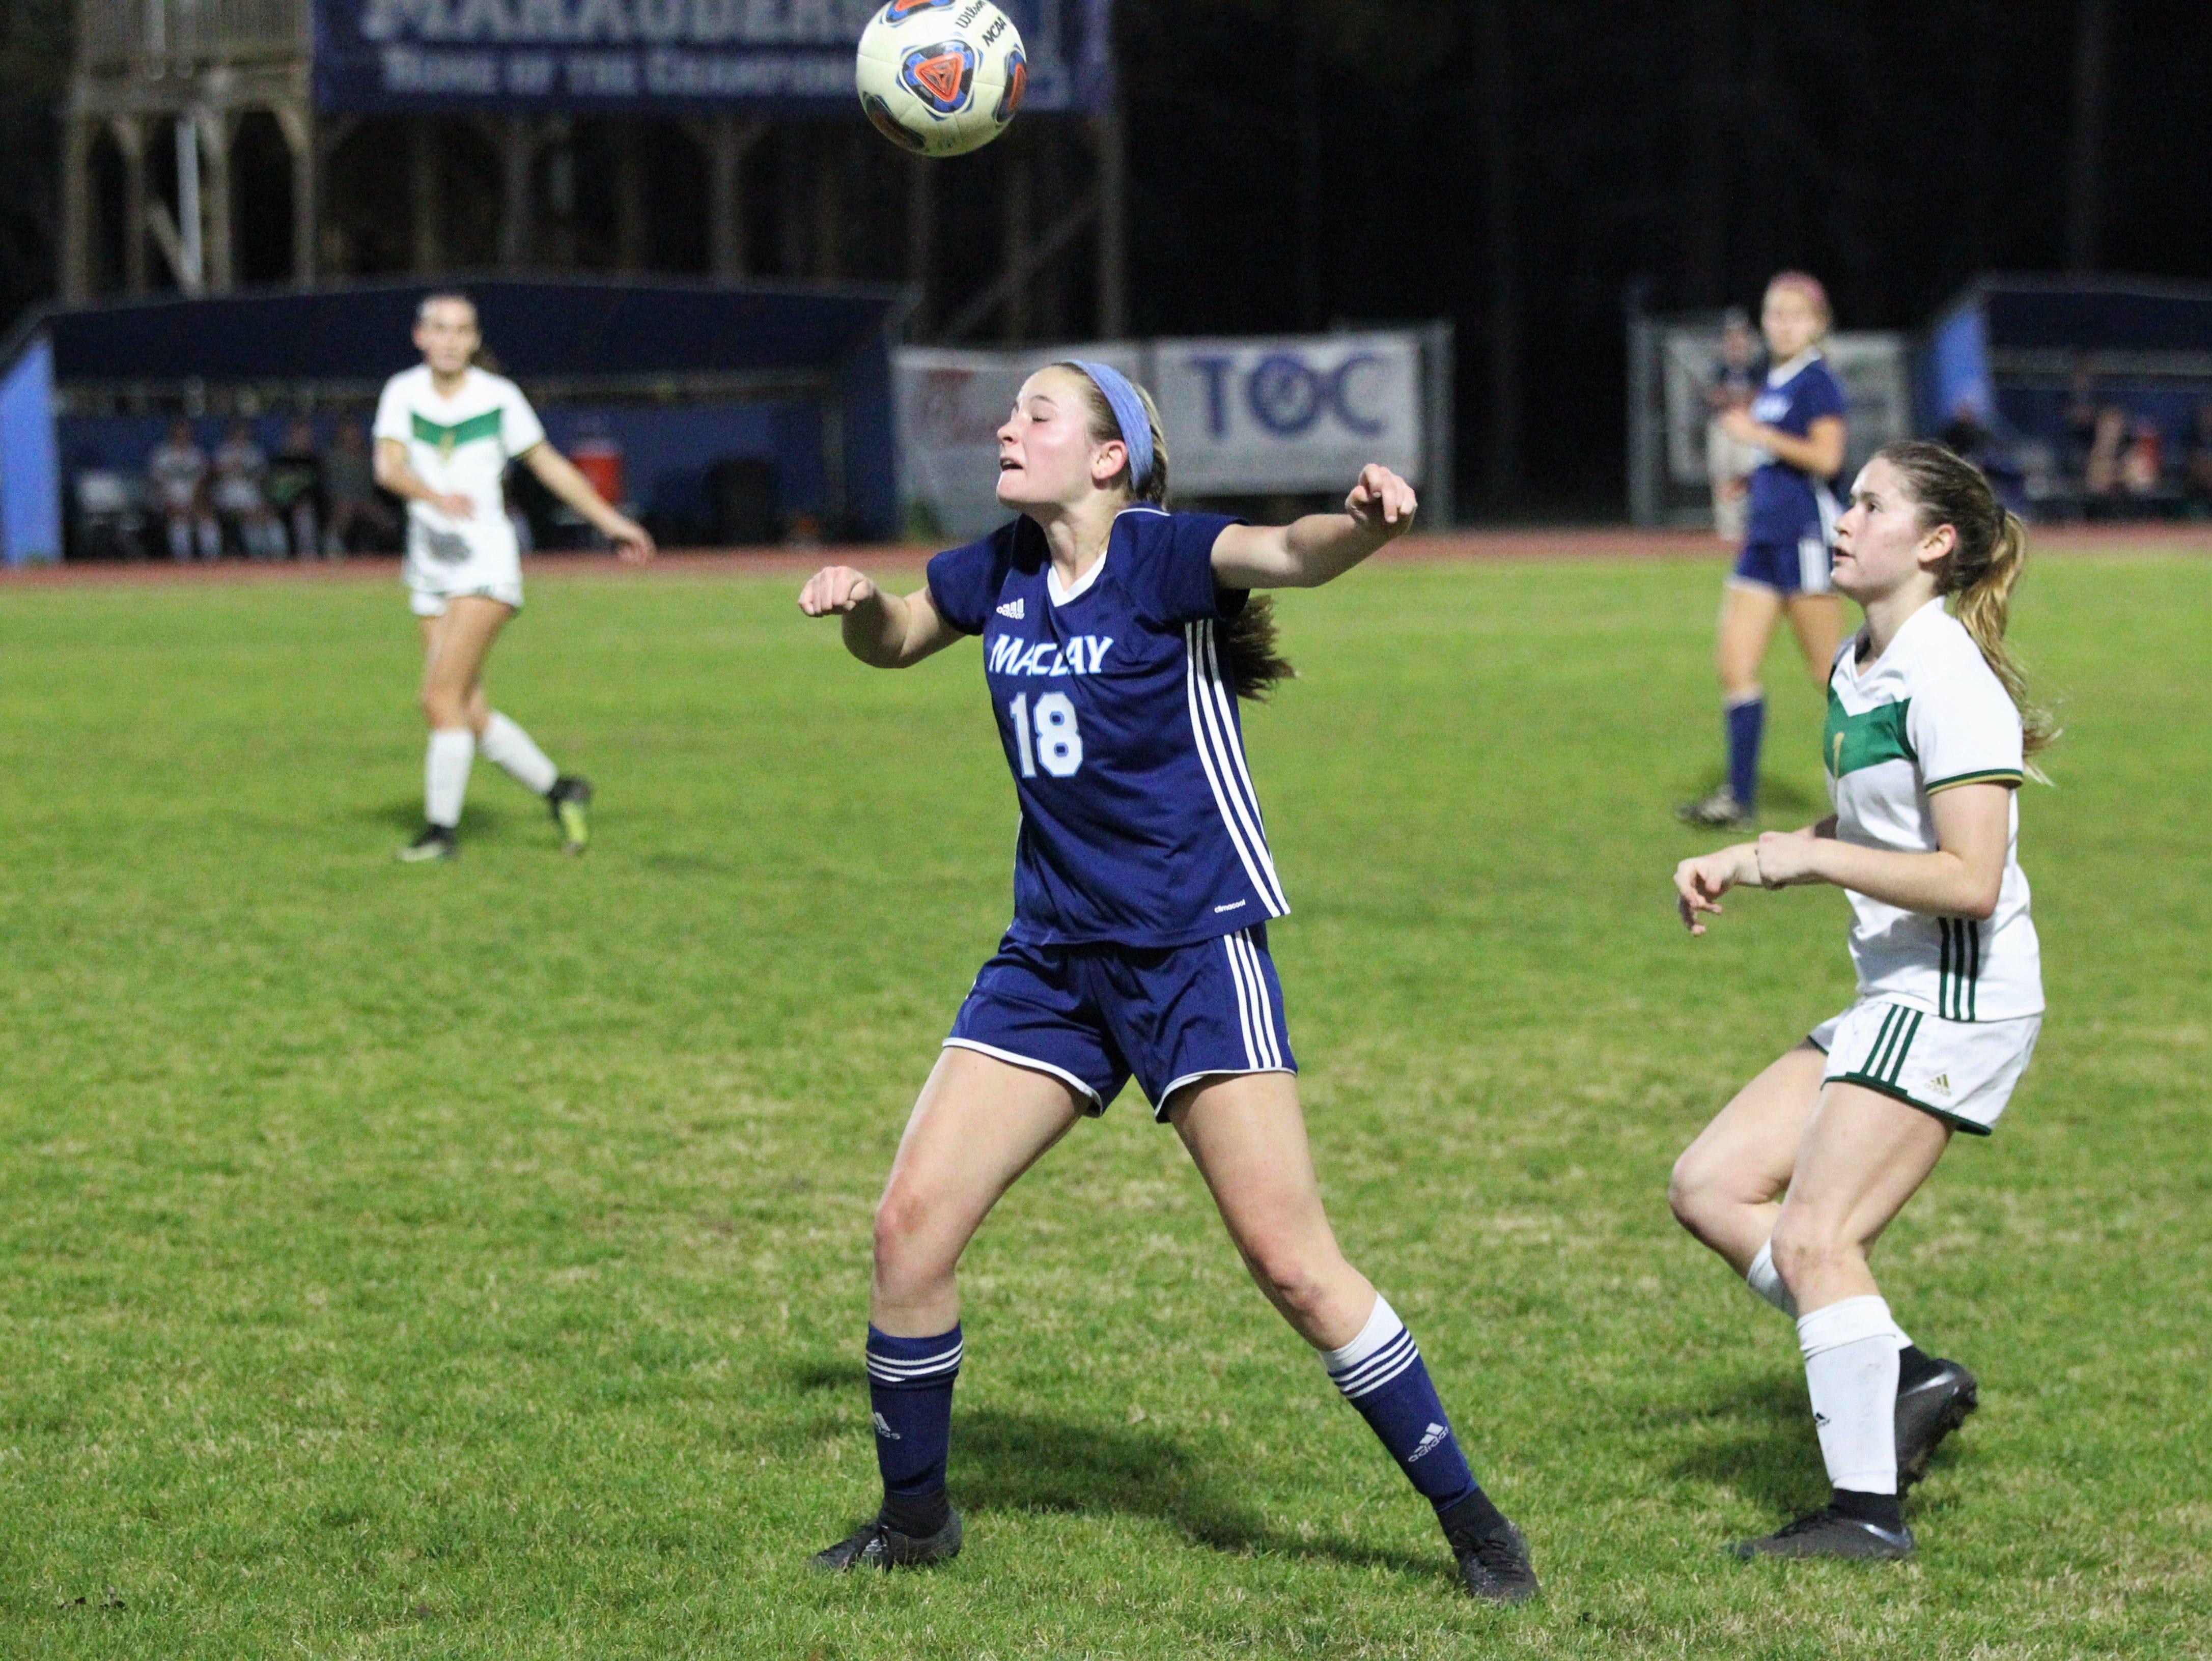 Maclay's Avery Smith waits on a header as Maclay's girls soccer team beat St. Joseph Academy 4-0 in a Region 1-1A quarterfinal on Jan. 5, 2019.